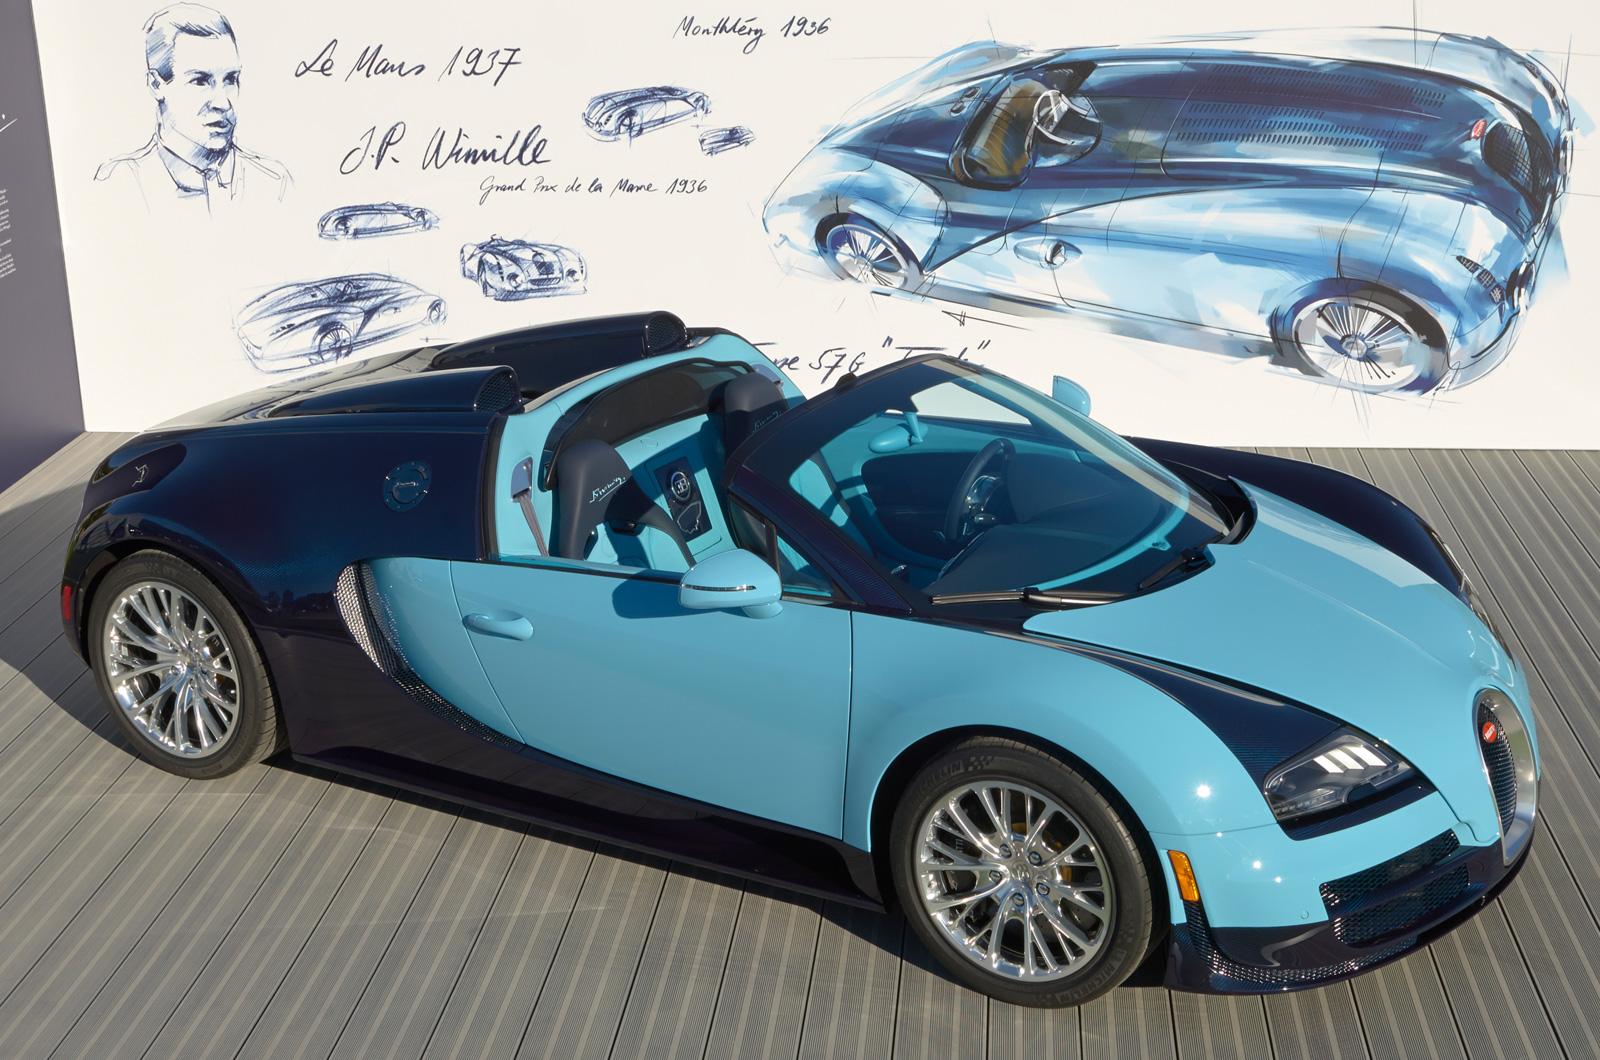 bugatti veyron 16 4 grand sport vitesse legend jean pierre wimille revealed. Black Bedroom Furniture Sets. Home Design Ideas